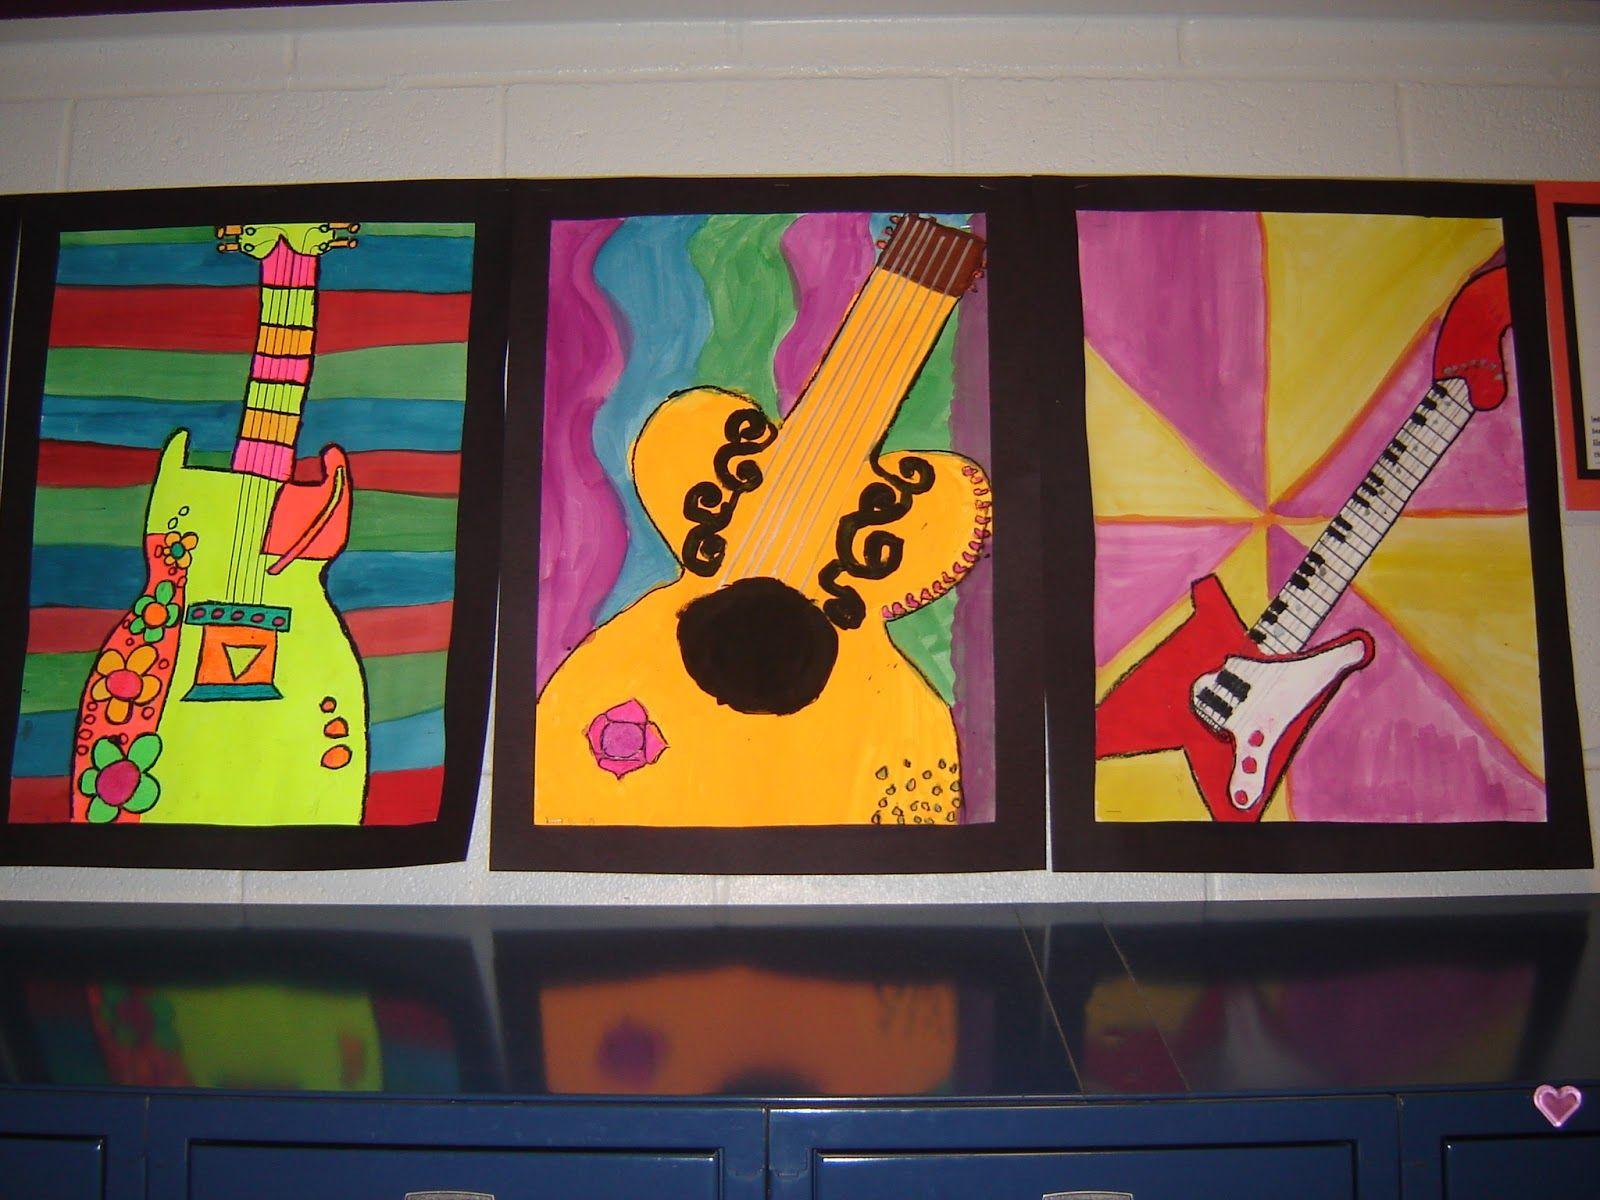 Guitars lines & colors show guitar sounds